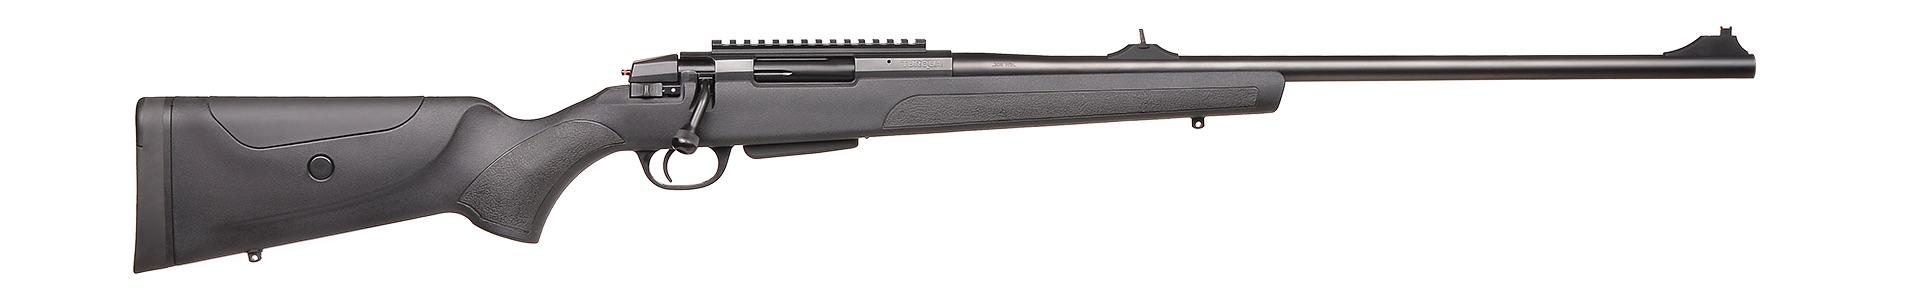 Нарезной карабин ATA ARMS Мод. TURQUA G2 SYNTHETIC BLACK ADJ - F92717